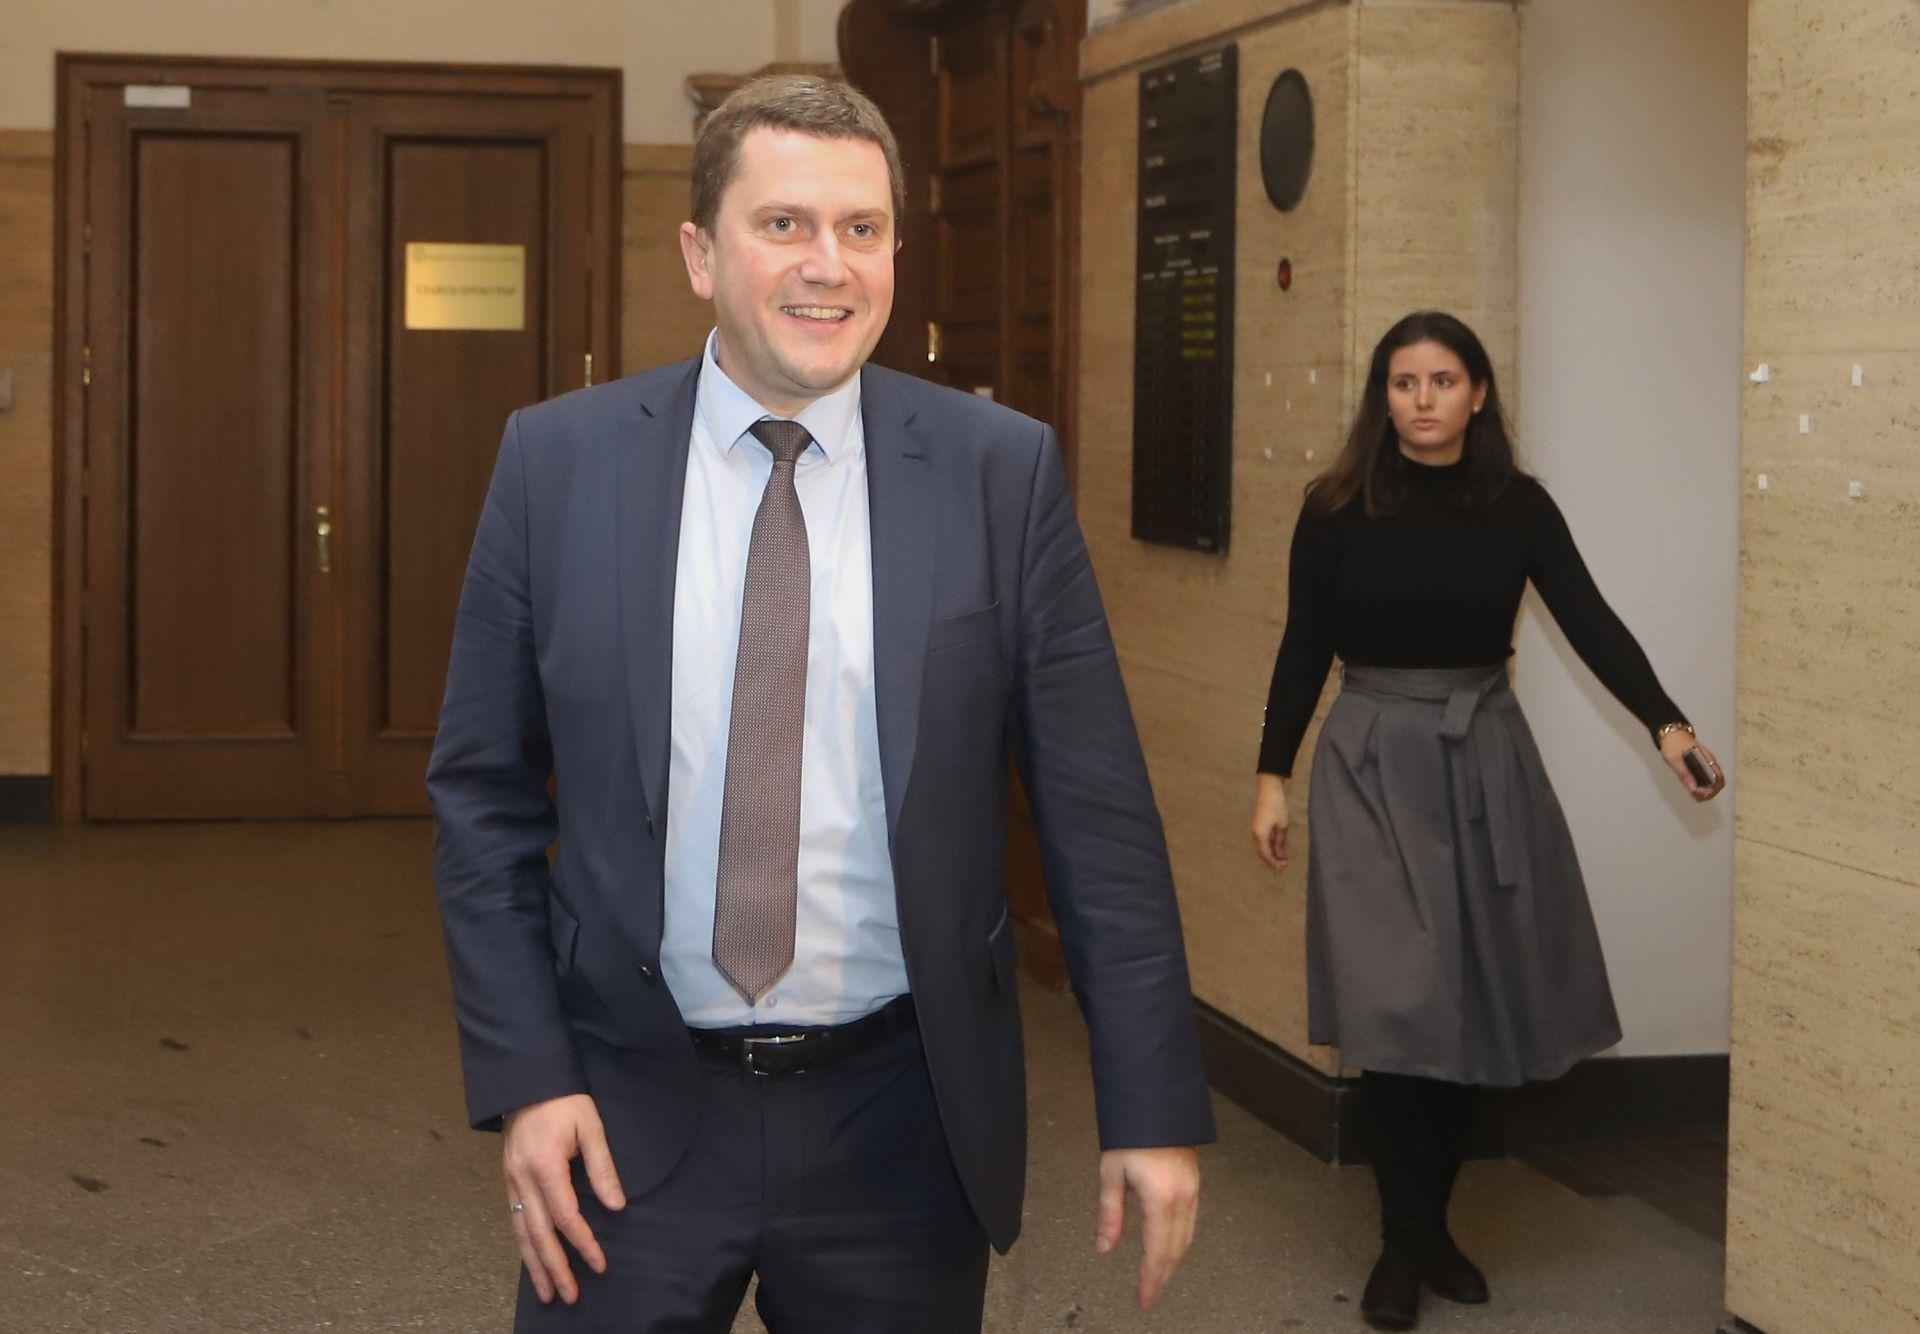 Кметът на Перник Станислав Владимиров се срещна с главния прокурор Сотир Цацаров